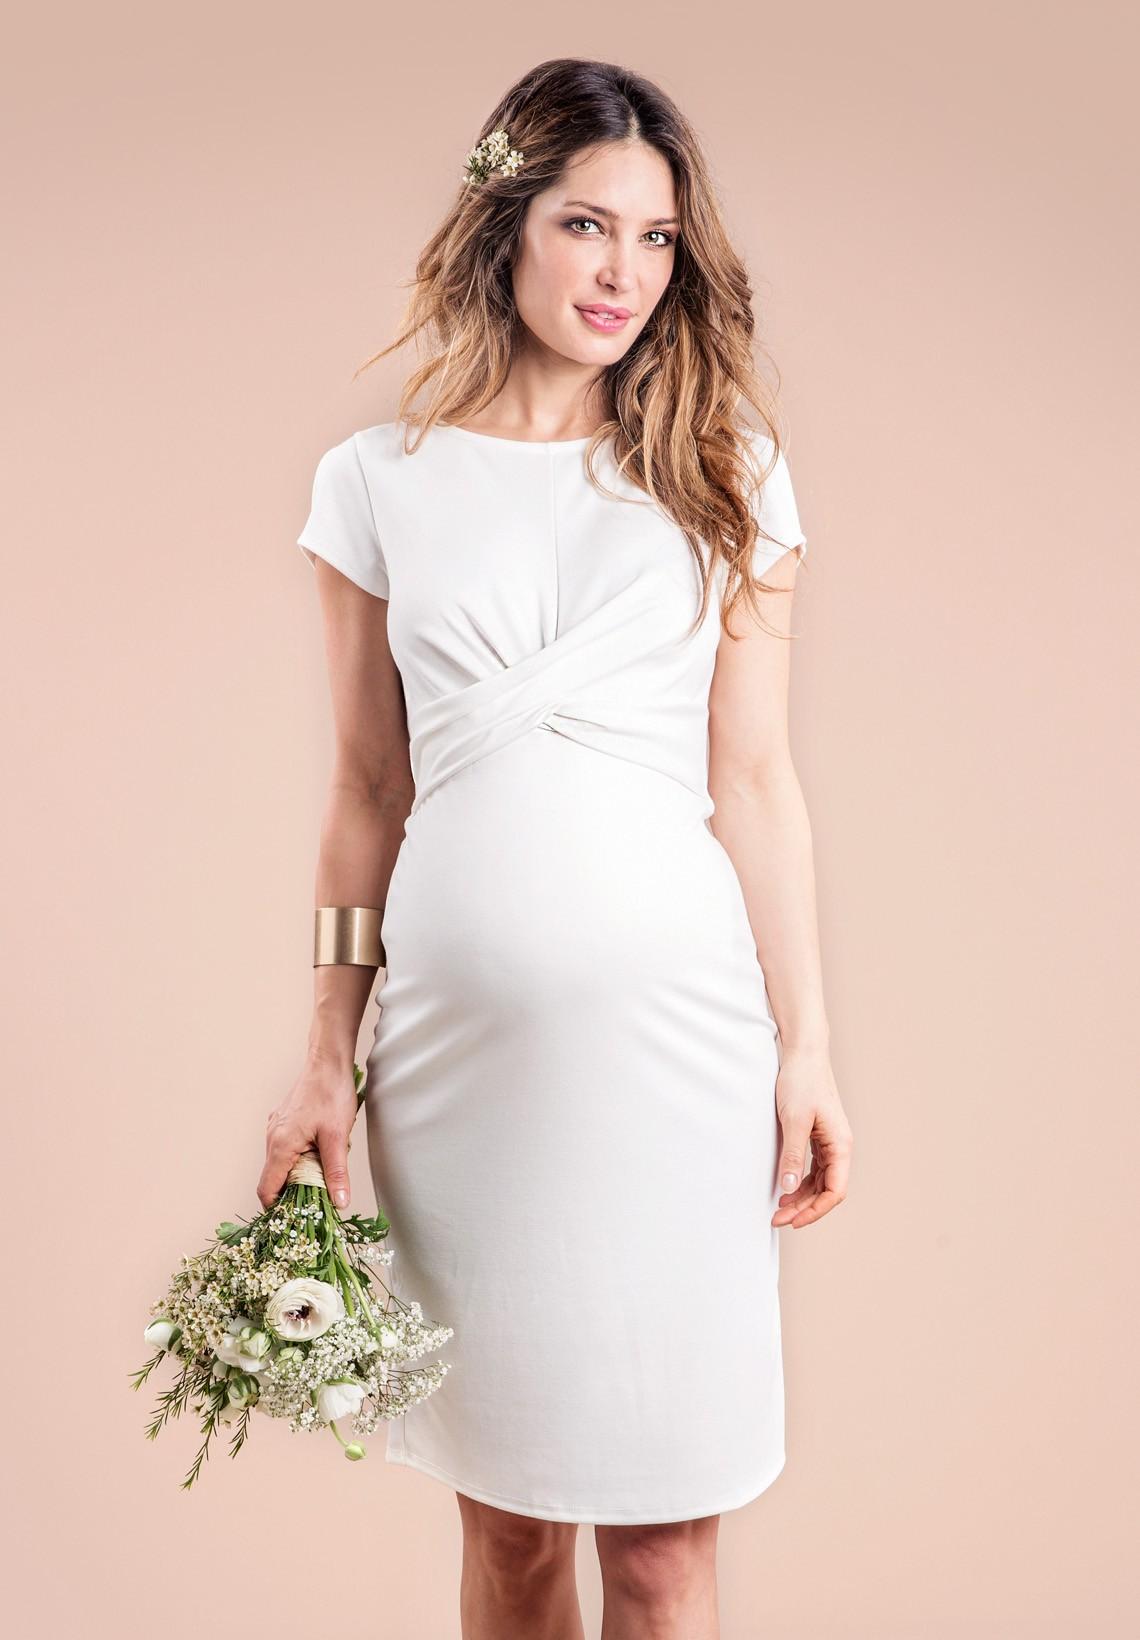 robe de mari e femme enceinte le mariage. Black Bedroom Furniture Sets. Home Design Ideas